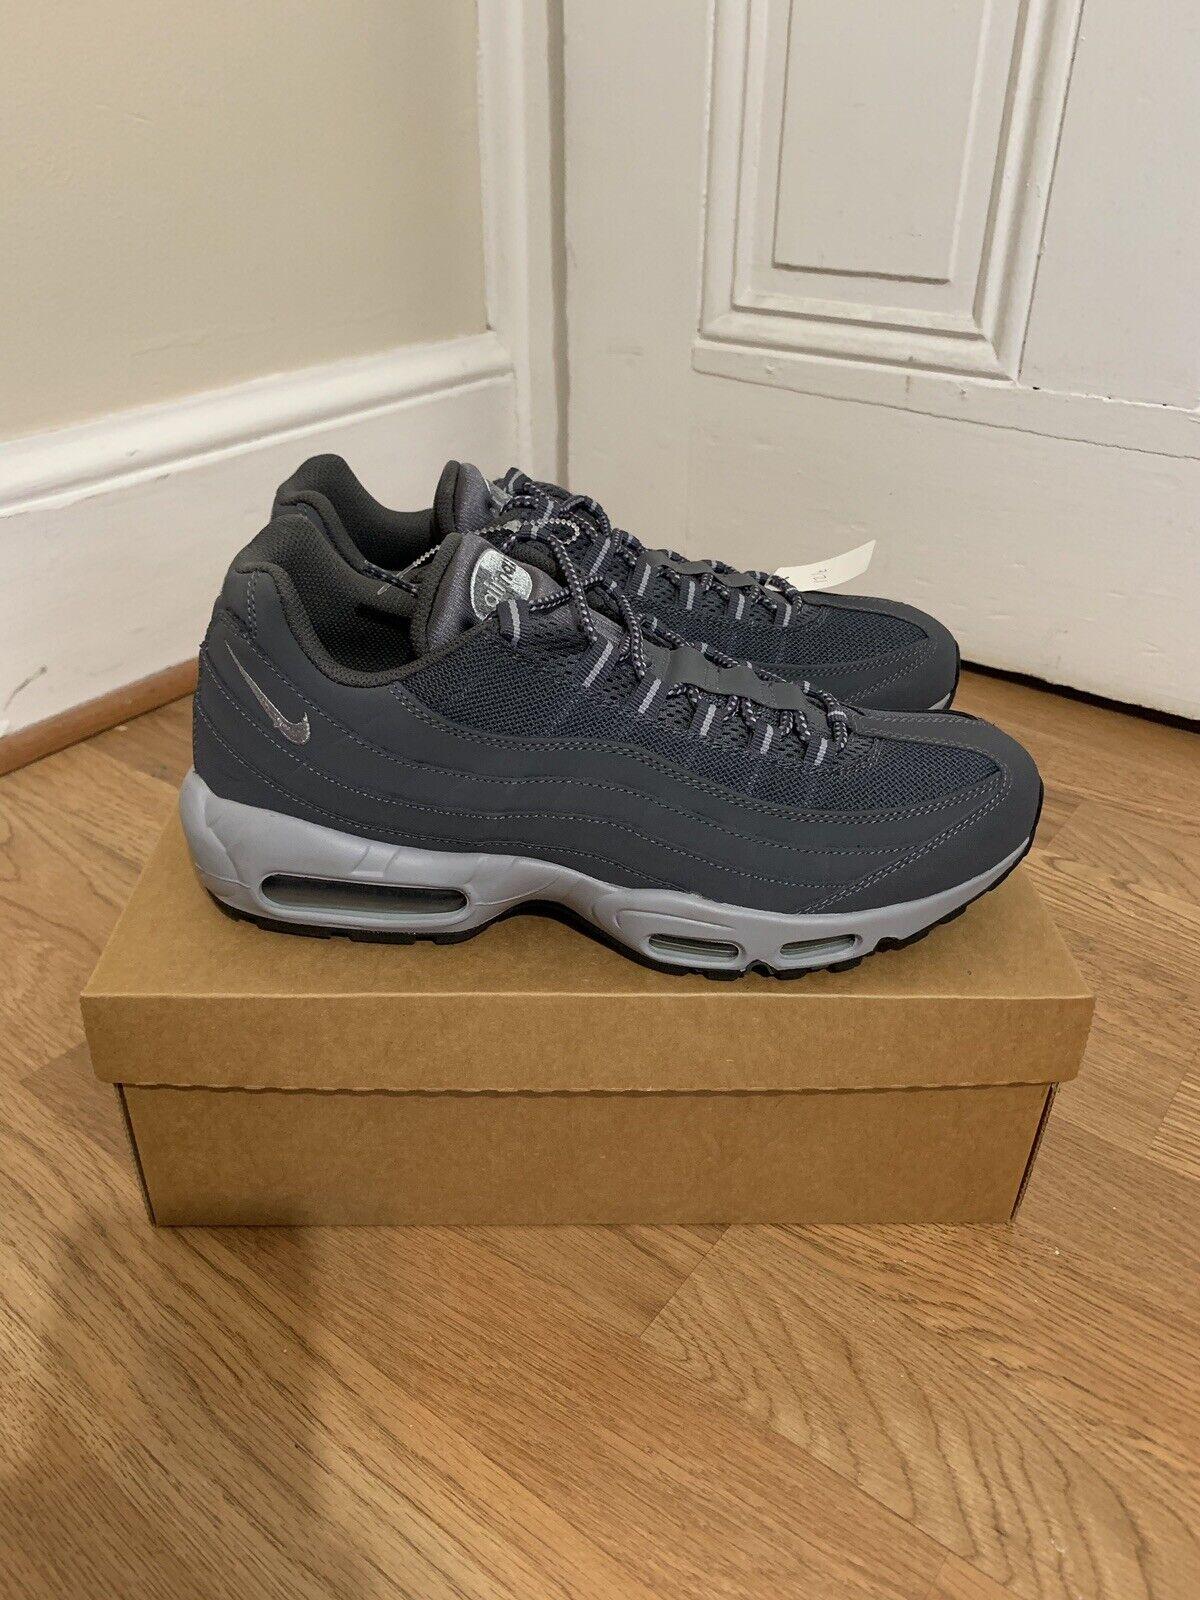 new concept 96b66 5ea21 Nike Air Max  95 Dark Wolf Grey Black Black Black shoes 609048-088 Mens